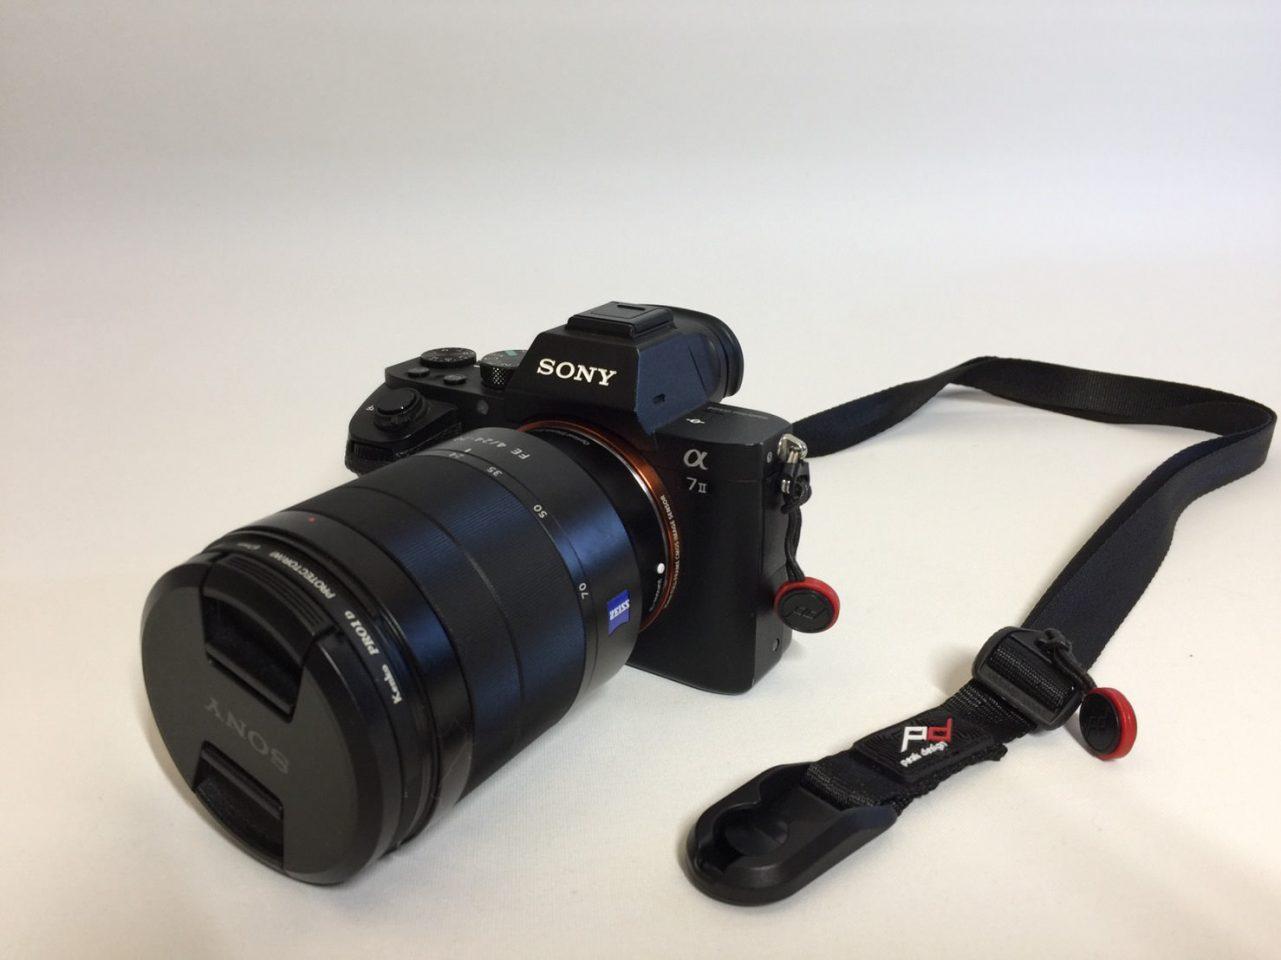 a7II + Vario-Tessar T* FE 24-70mm f/4 ZA OSS